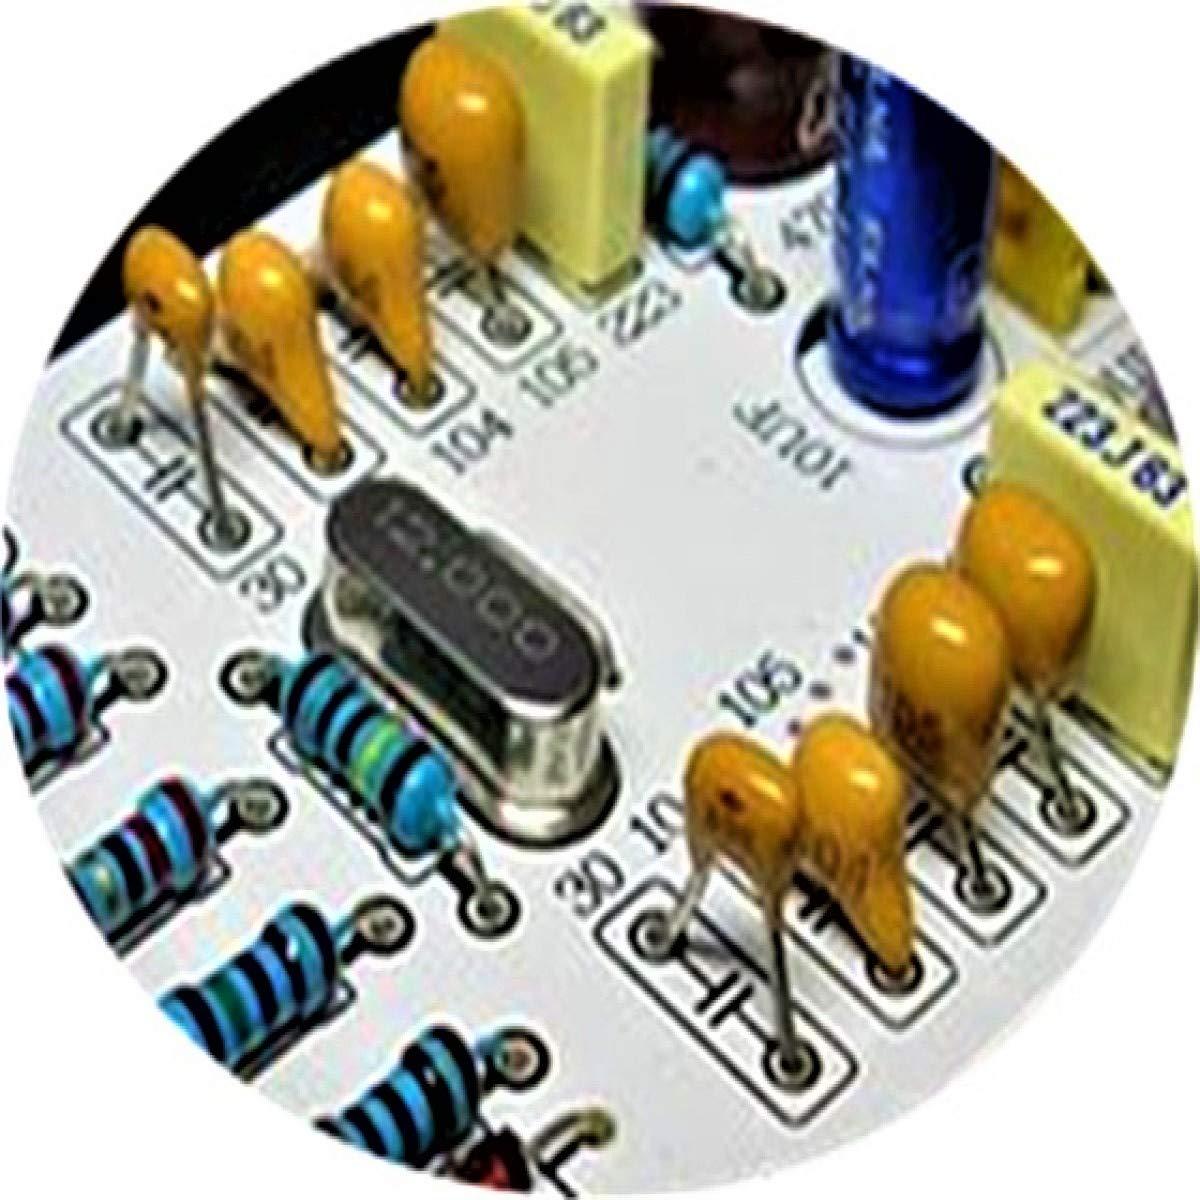 DaFuRui 330pcs DIP Monolithic Multilayer Ceramic Chip Capacitors Assortment Box Kit 22 Values X 15pcs 10pF-0.68uF